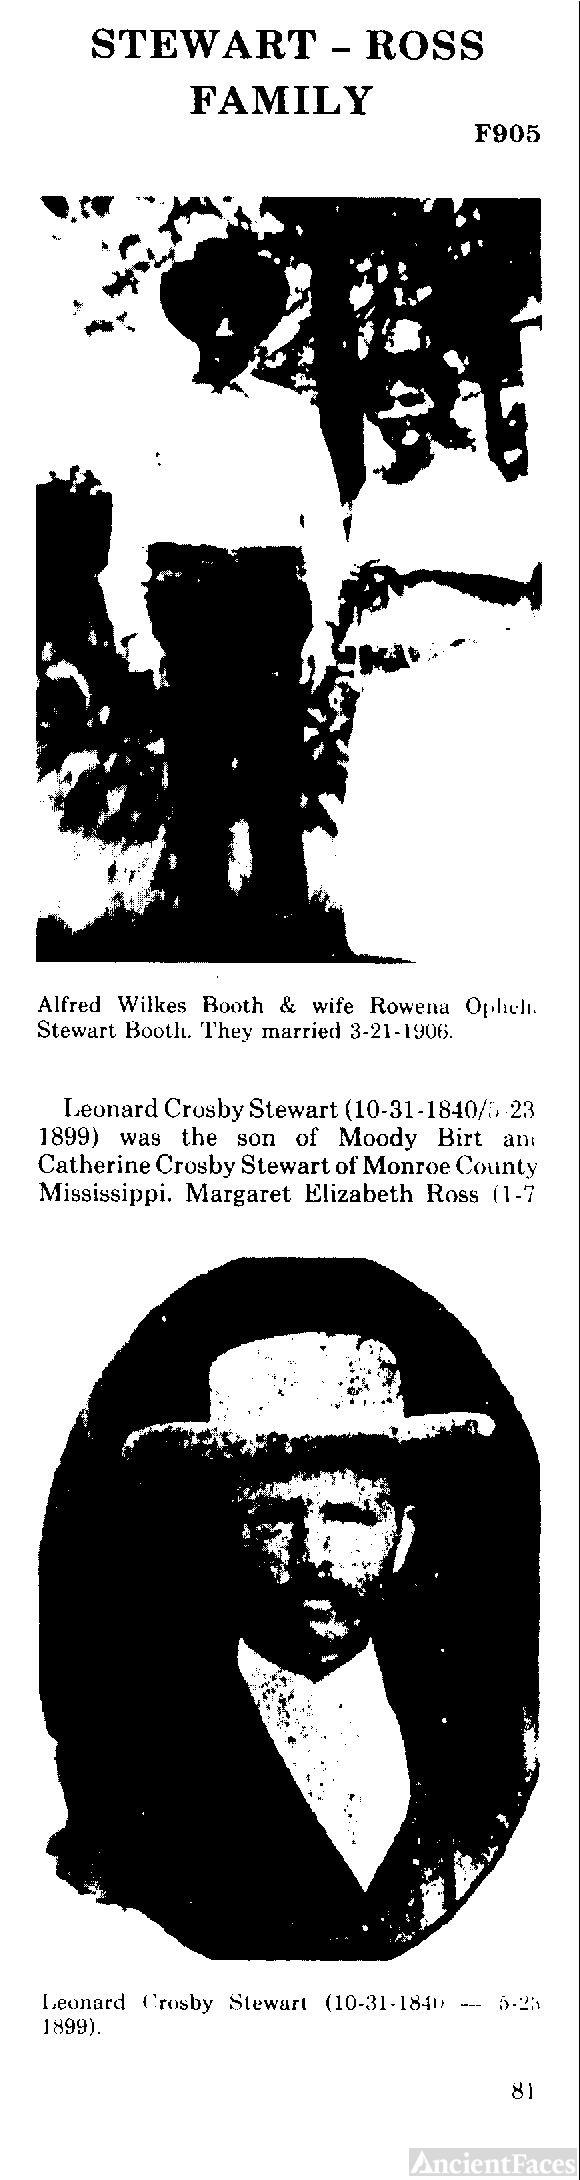 Leonard Crosby Stewart of Mississippi